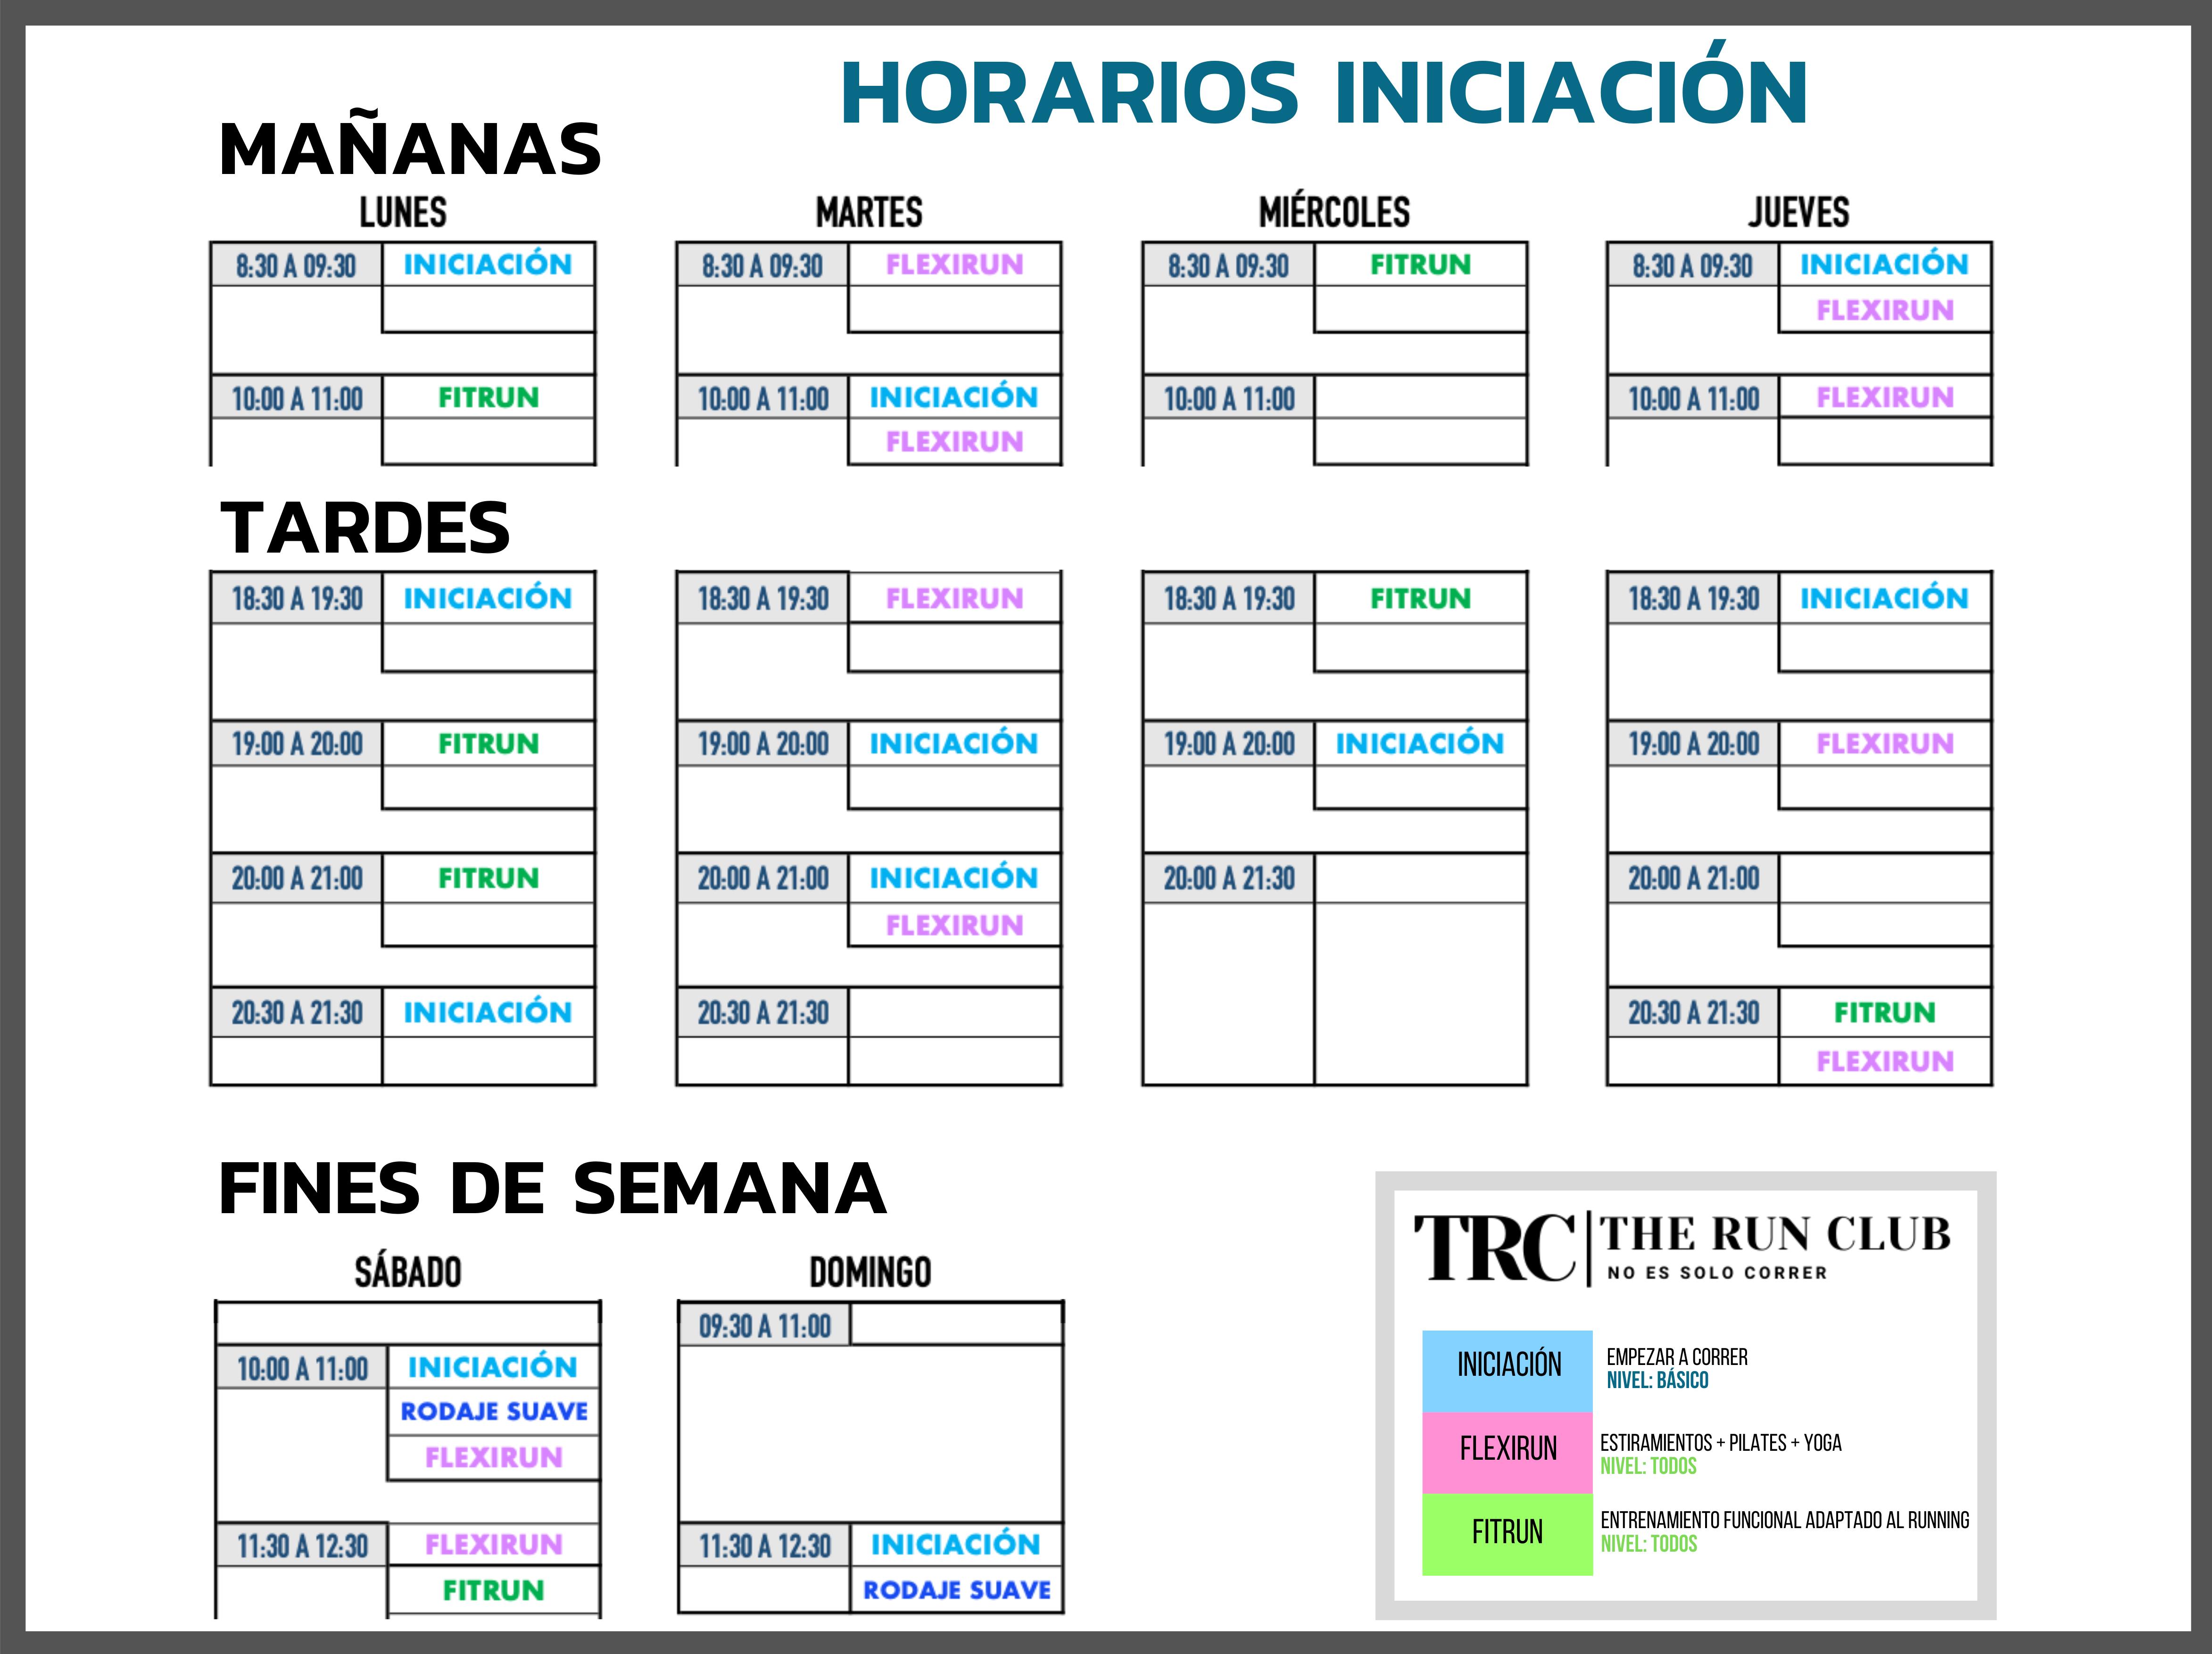 _HORARIO CURSO INICIACIÓN TEMPORADA 20-21 - TRC - THE RUN CLUB - CLUB DE CORREDORES MADRID